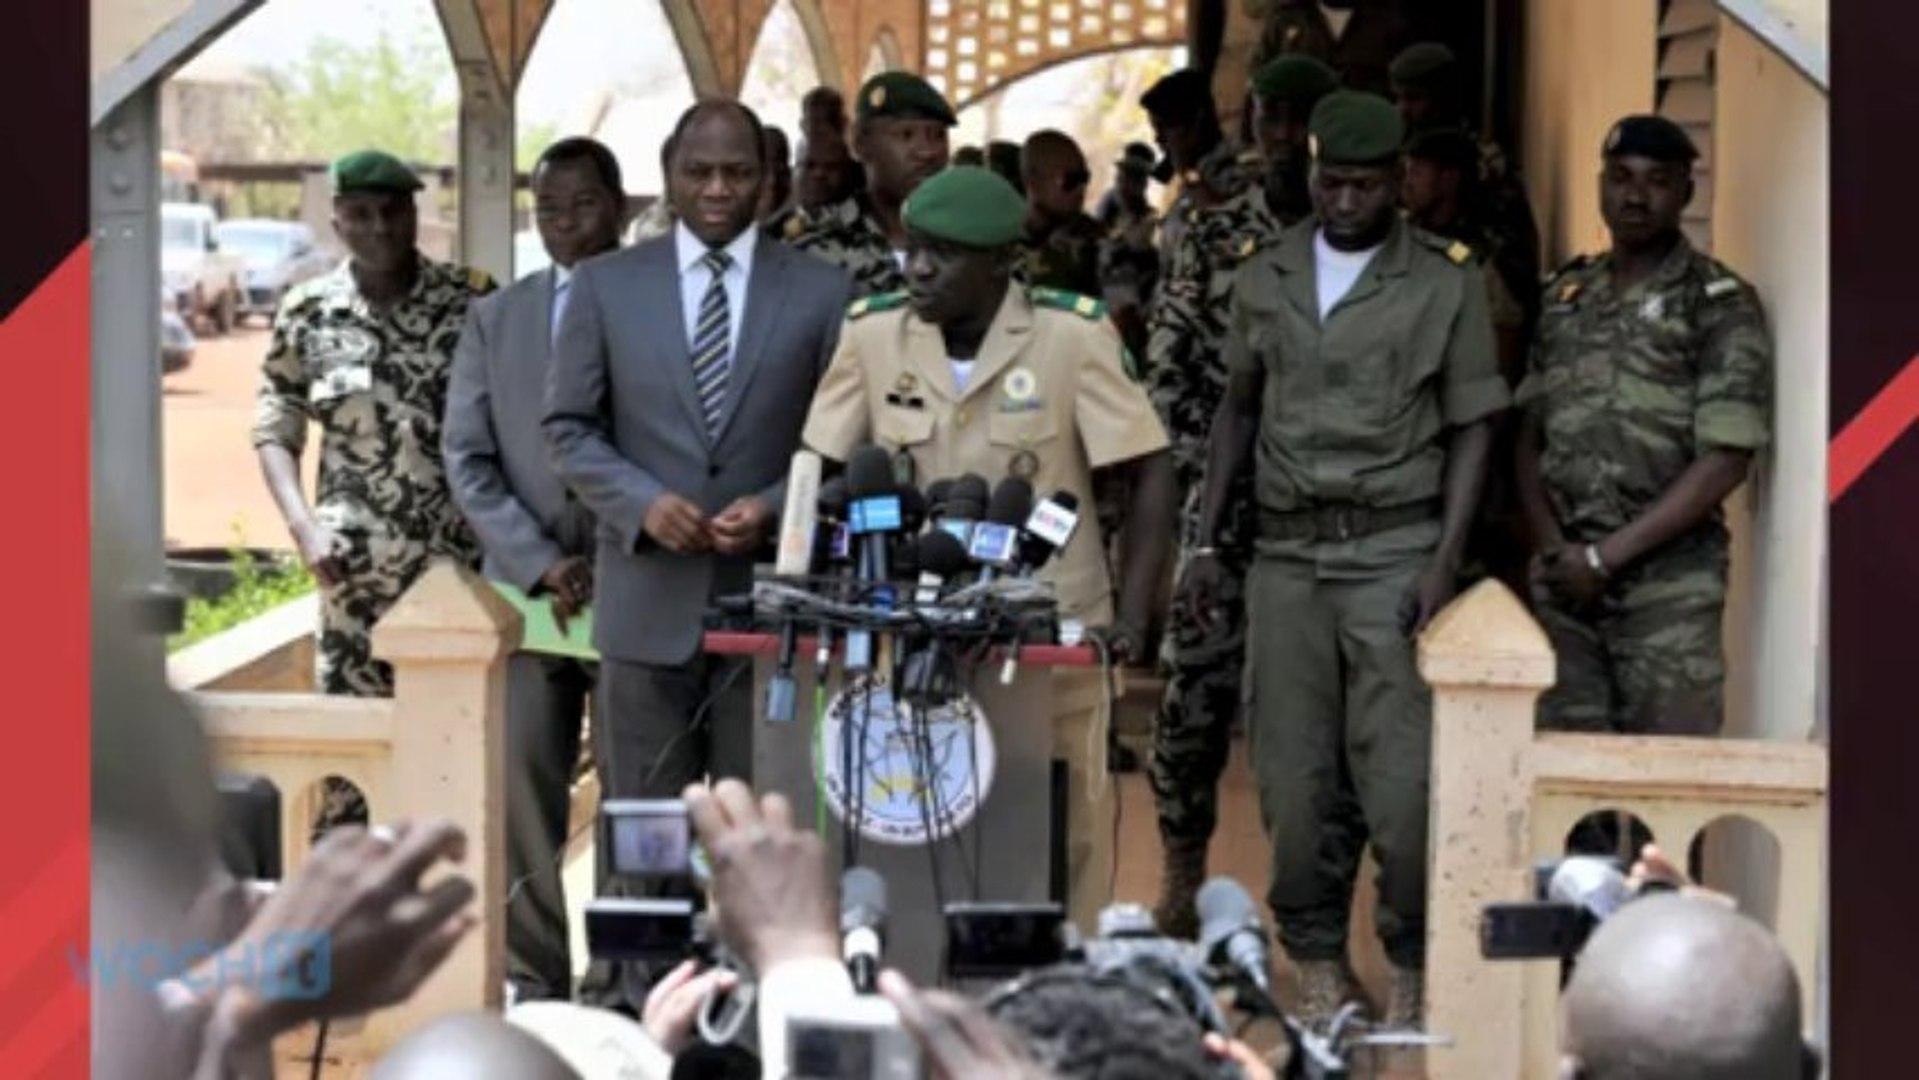 Mali's Ex-junta Chief Sanogo Detained: Defense Ministry